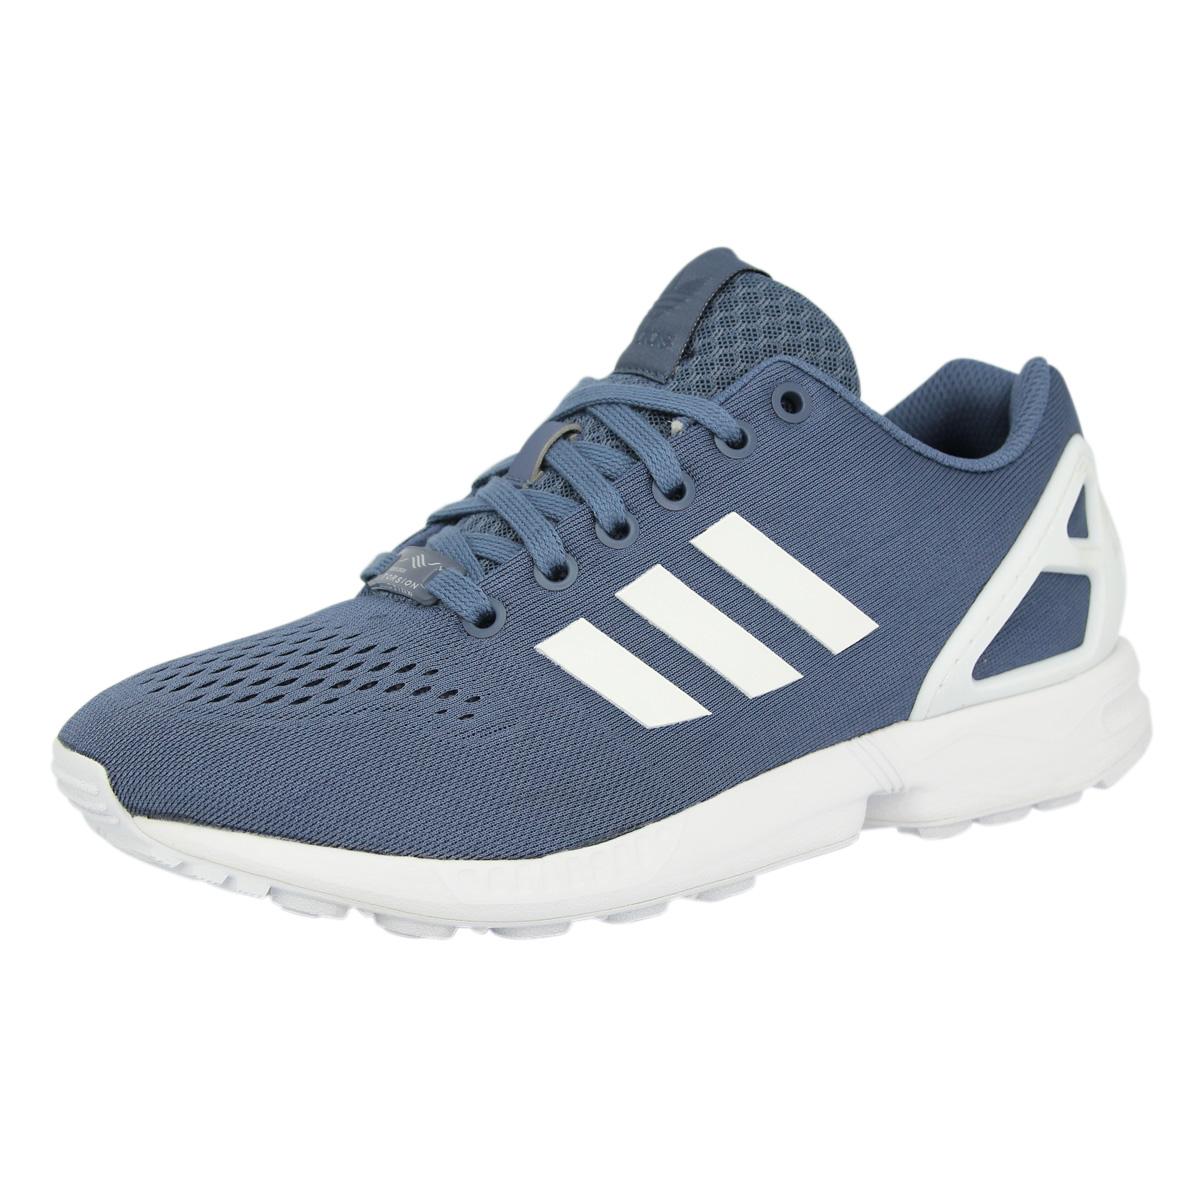 Adidas Originals ZX FLUX Blau EM Blau FLUX Herren Sneakers Schuhe Neu |   cb892c